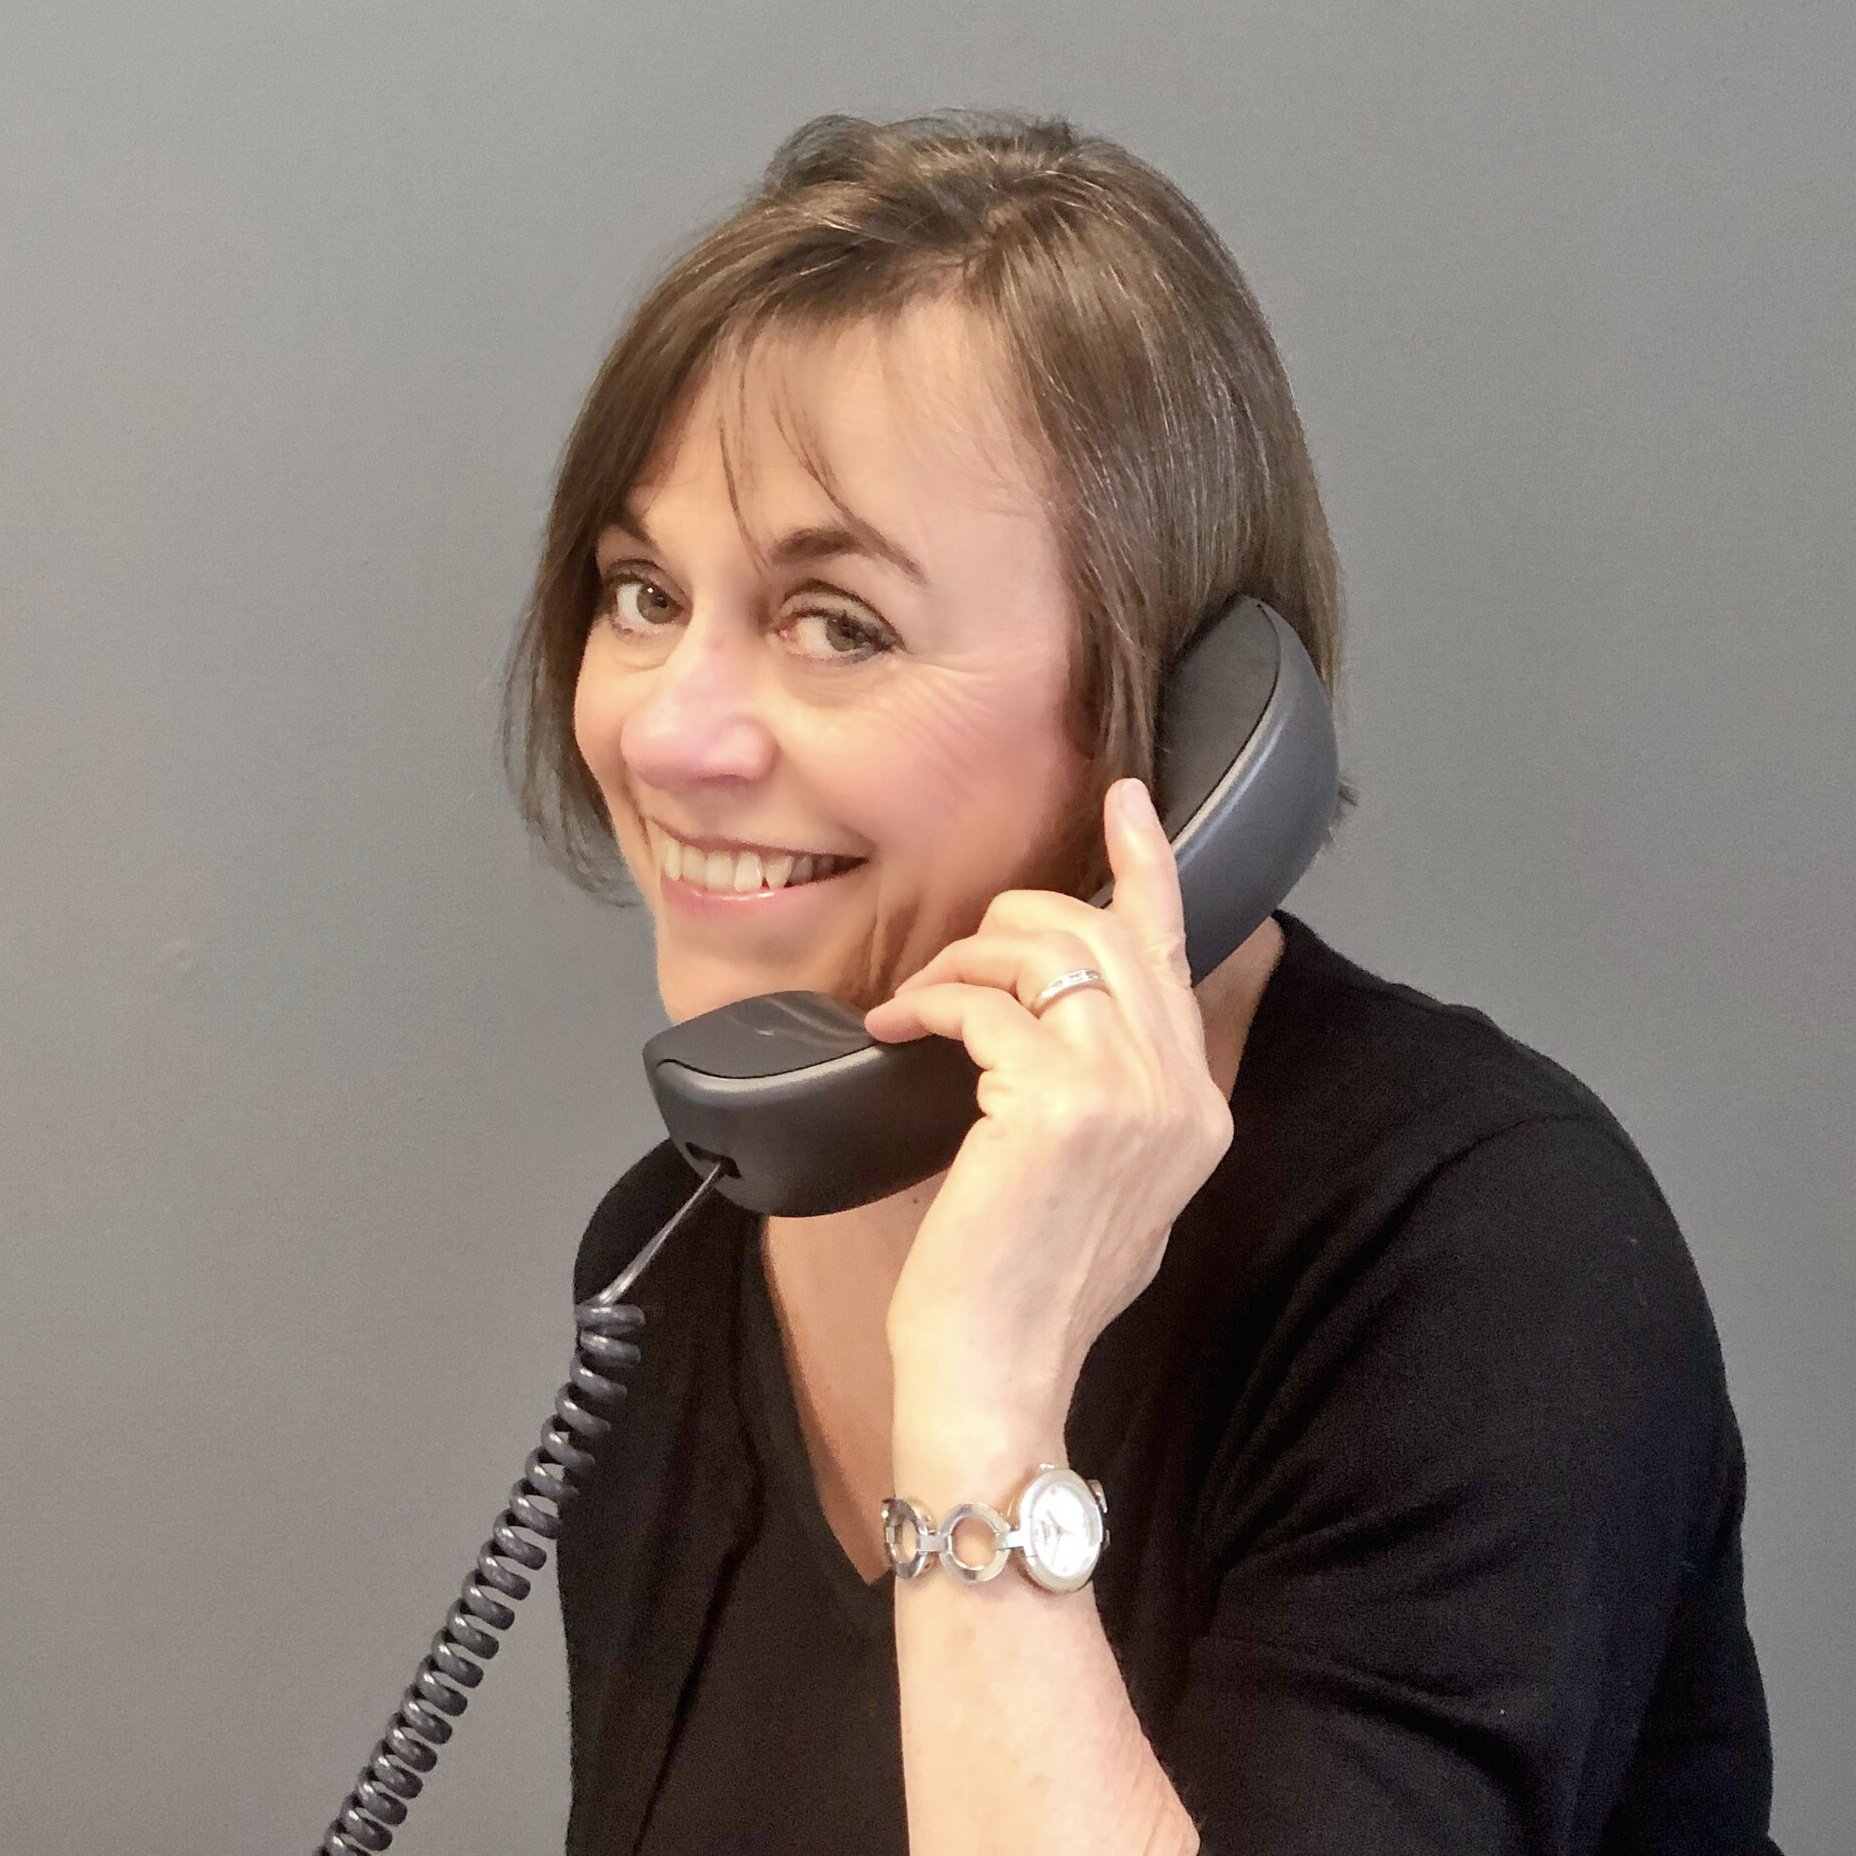 Heather Morgan, Senior Project Manager